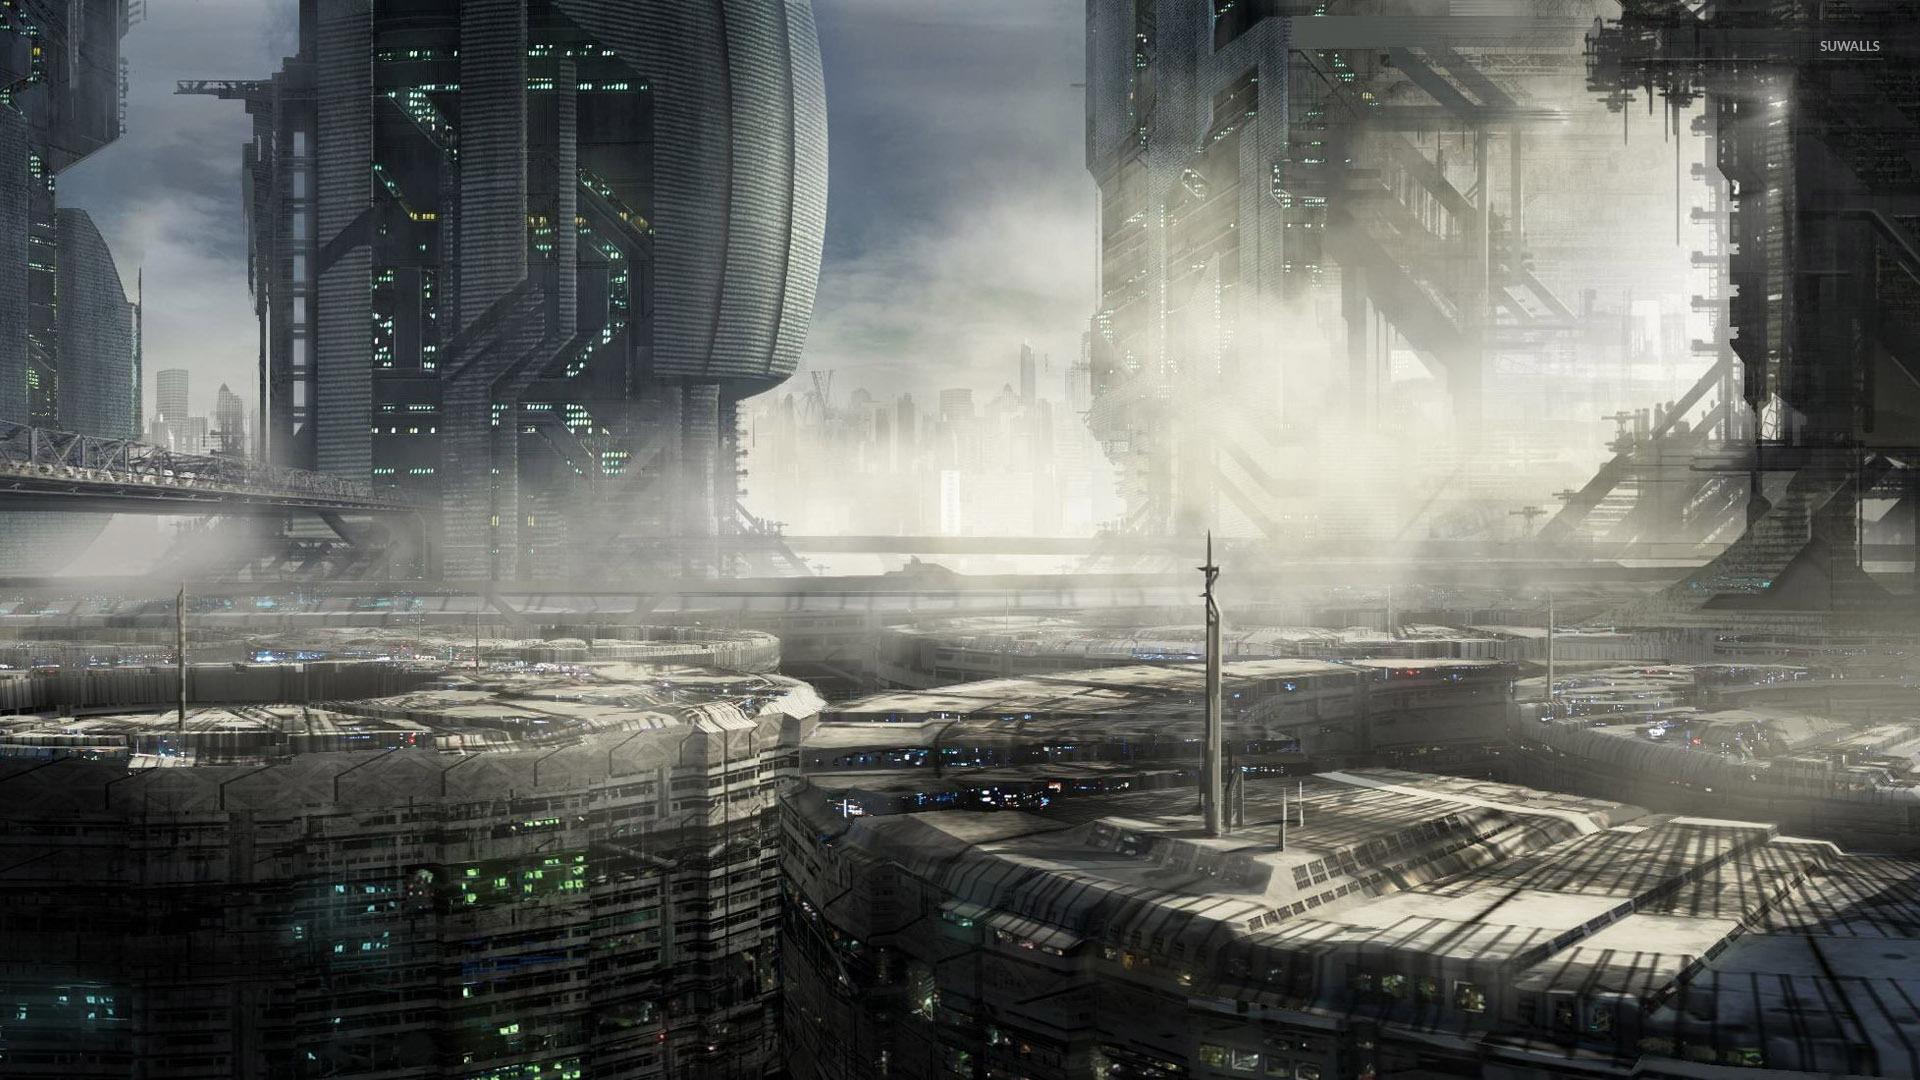 Cyberpunk architecture wallpaper  Fantasy wallpapers  29992